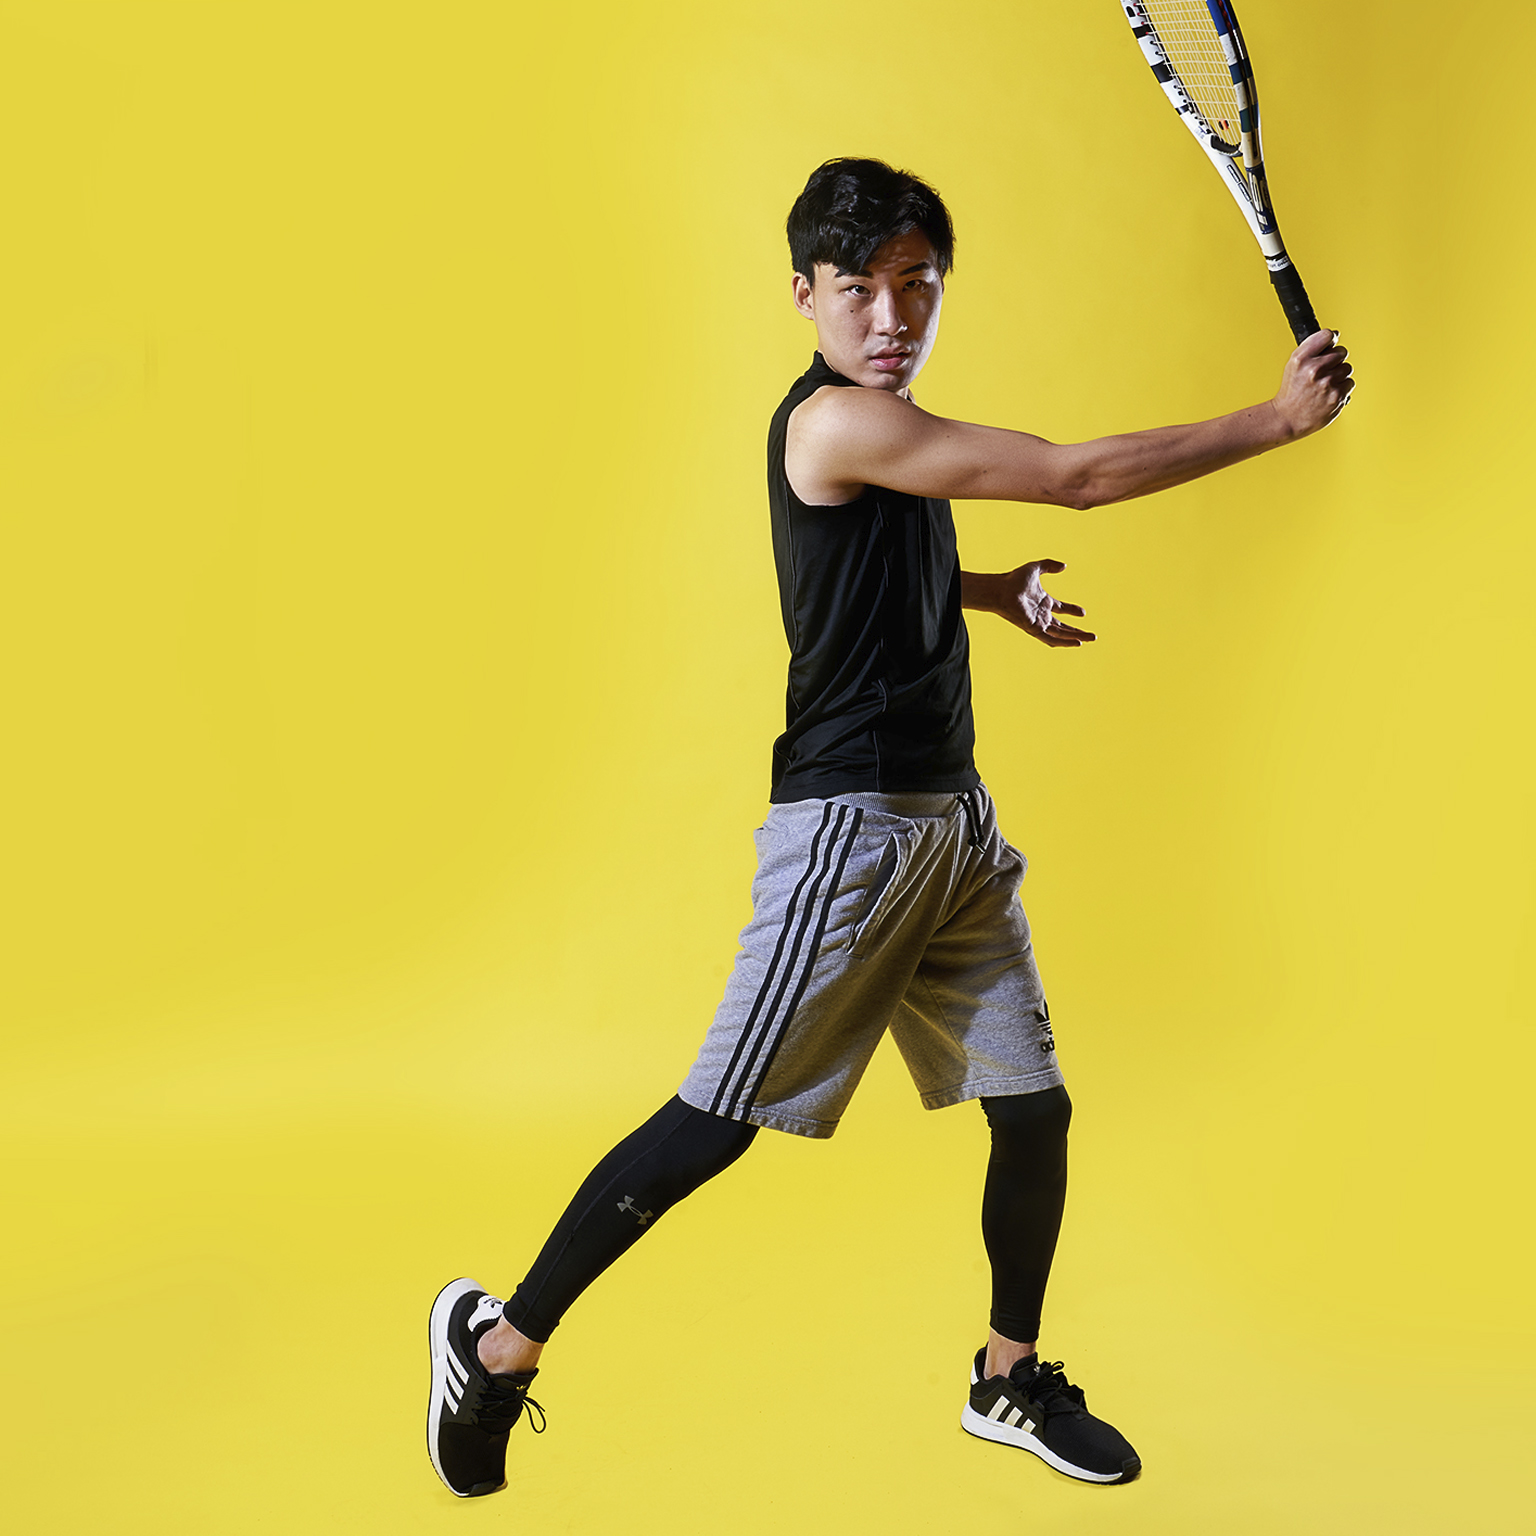 Toronto-Fitness-Model-Agency-Fitness-Casual-Commercial-Junhyuk-Ko-Fitness-Tennis